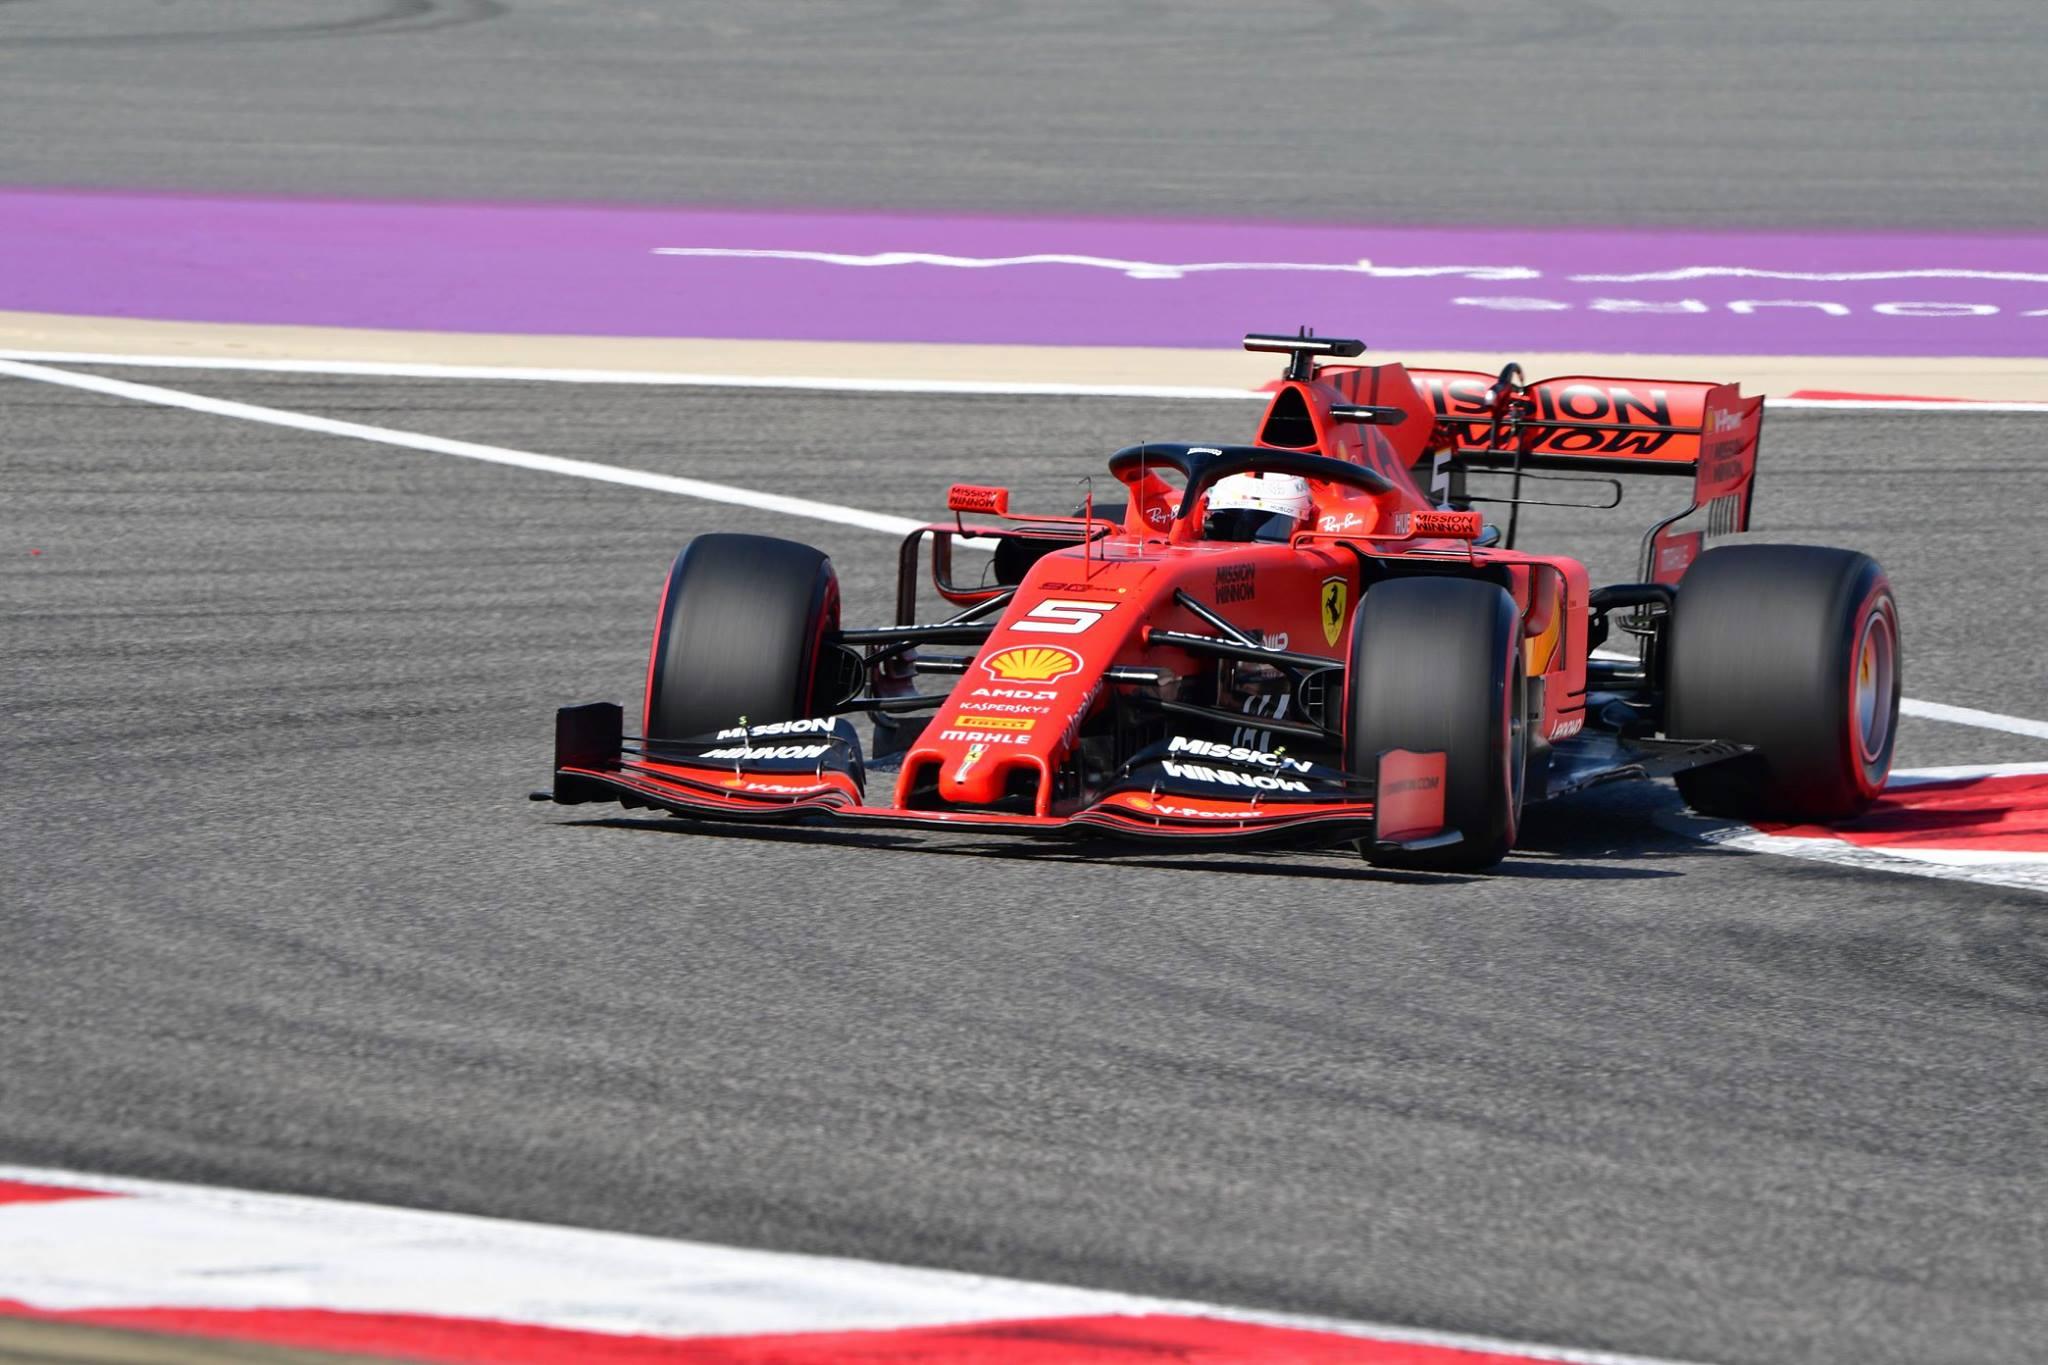 Scuderia Ferrari - Bahrain Grand Prix